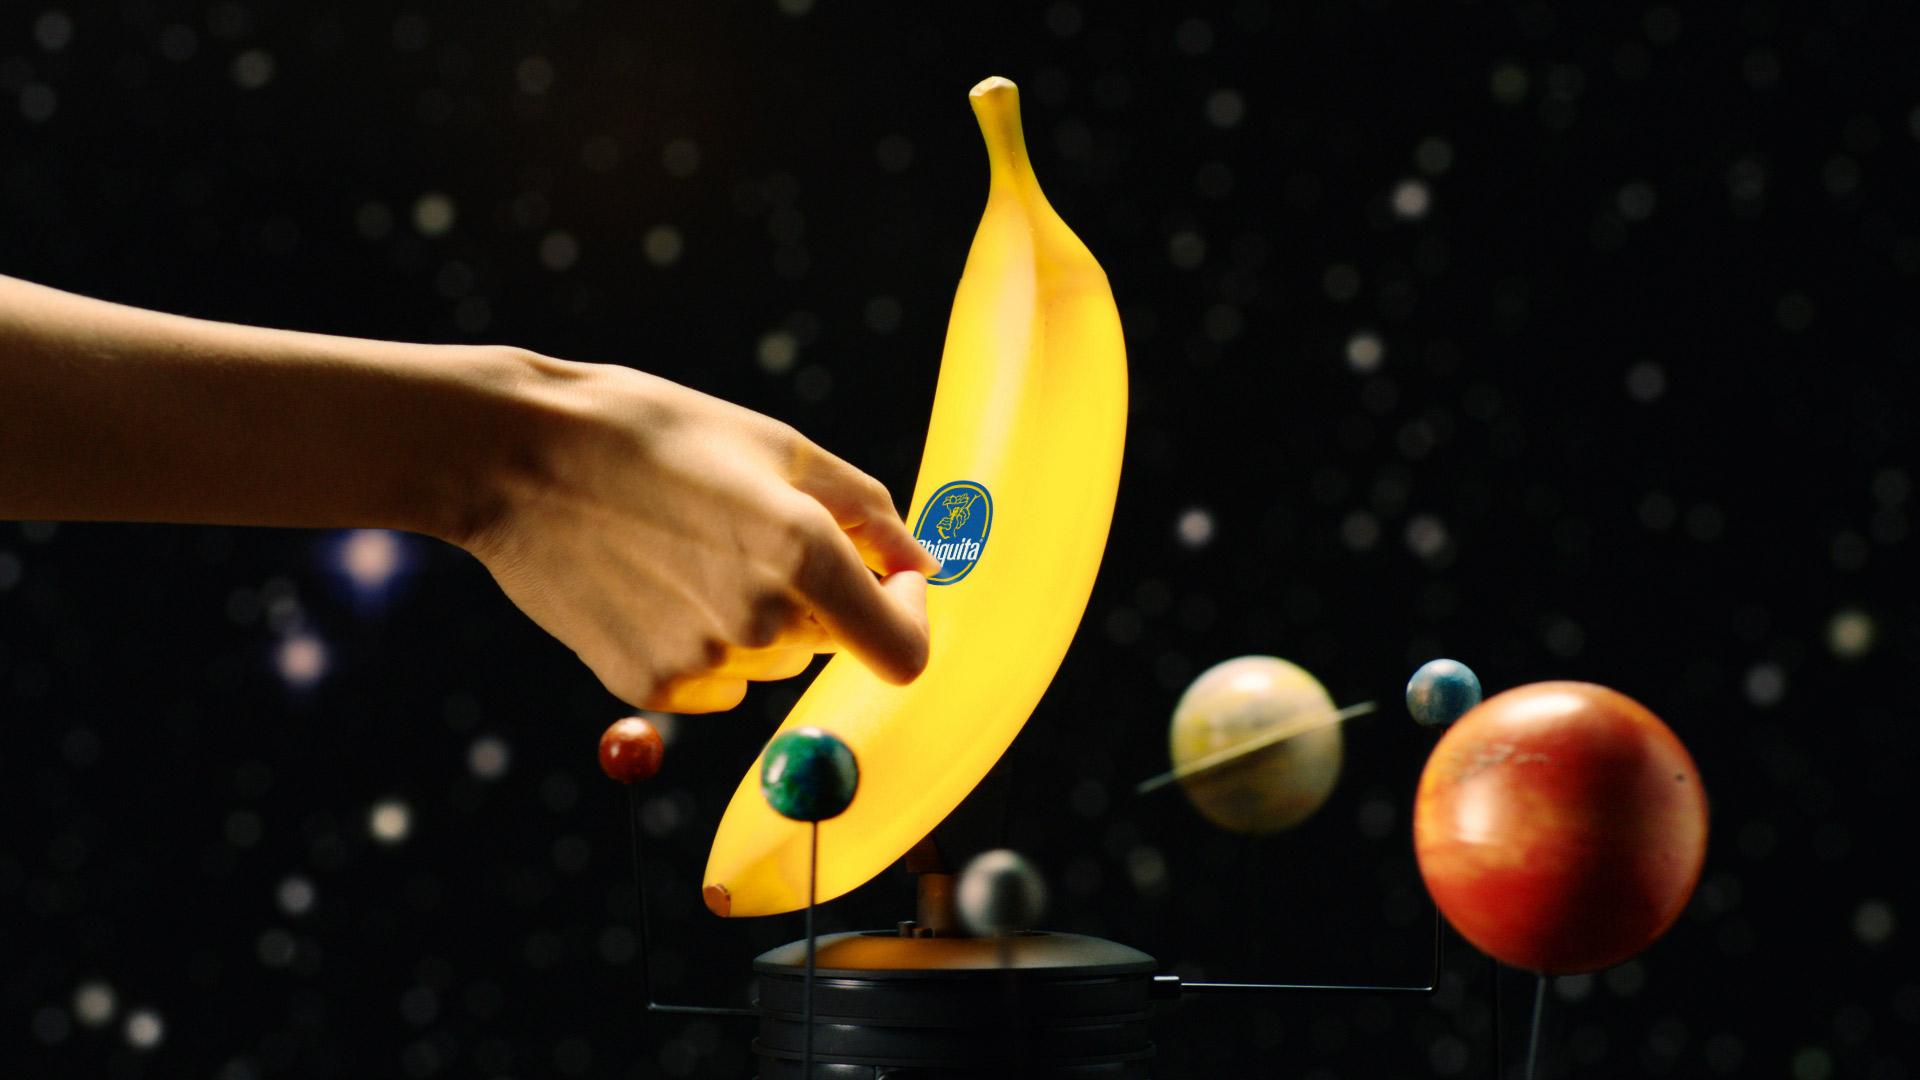 Bananalamp.jpg